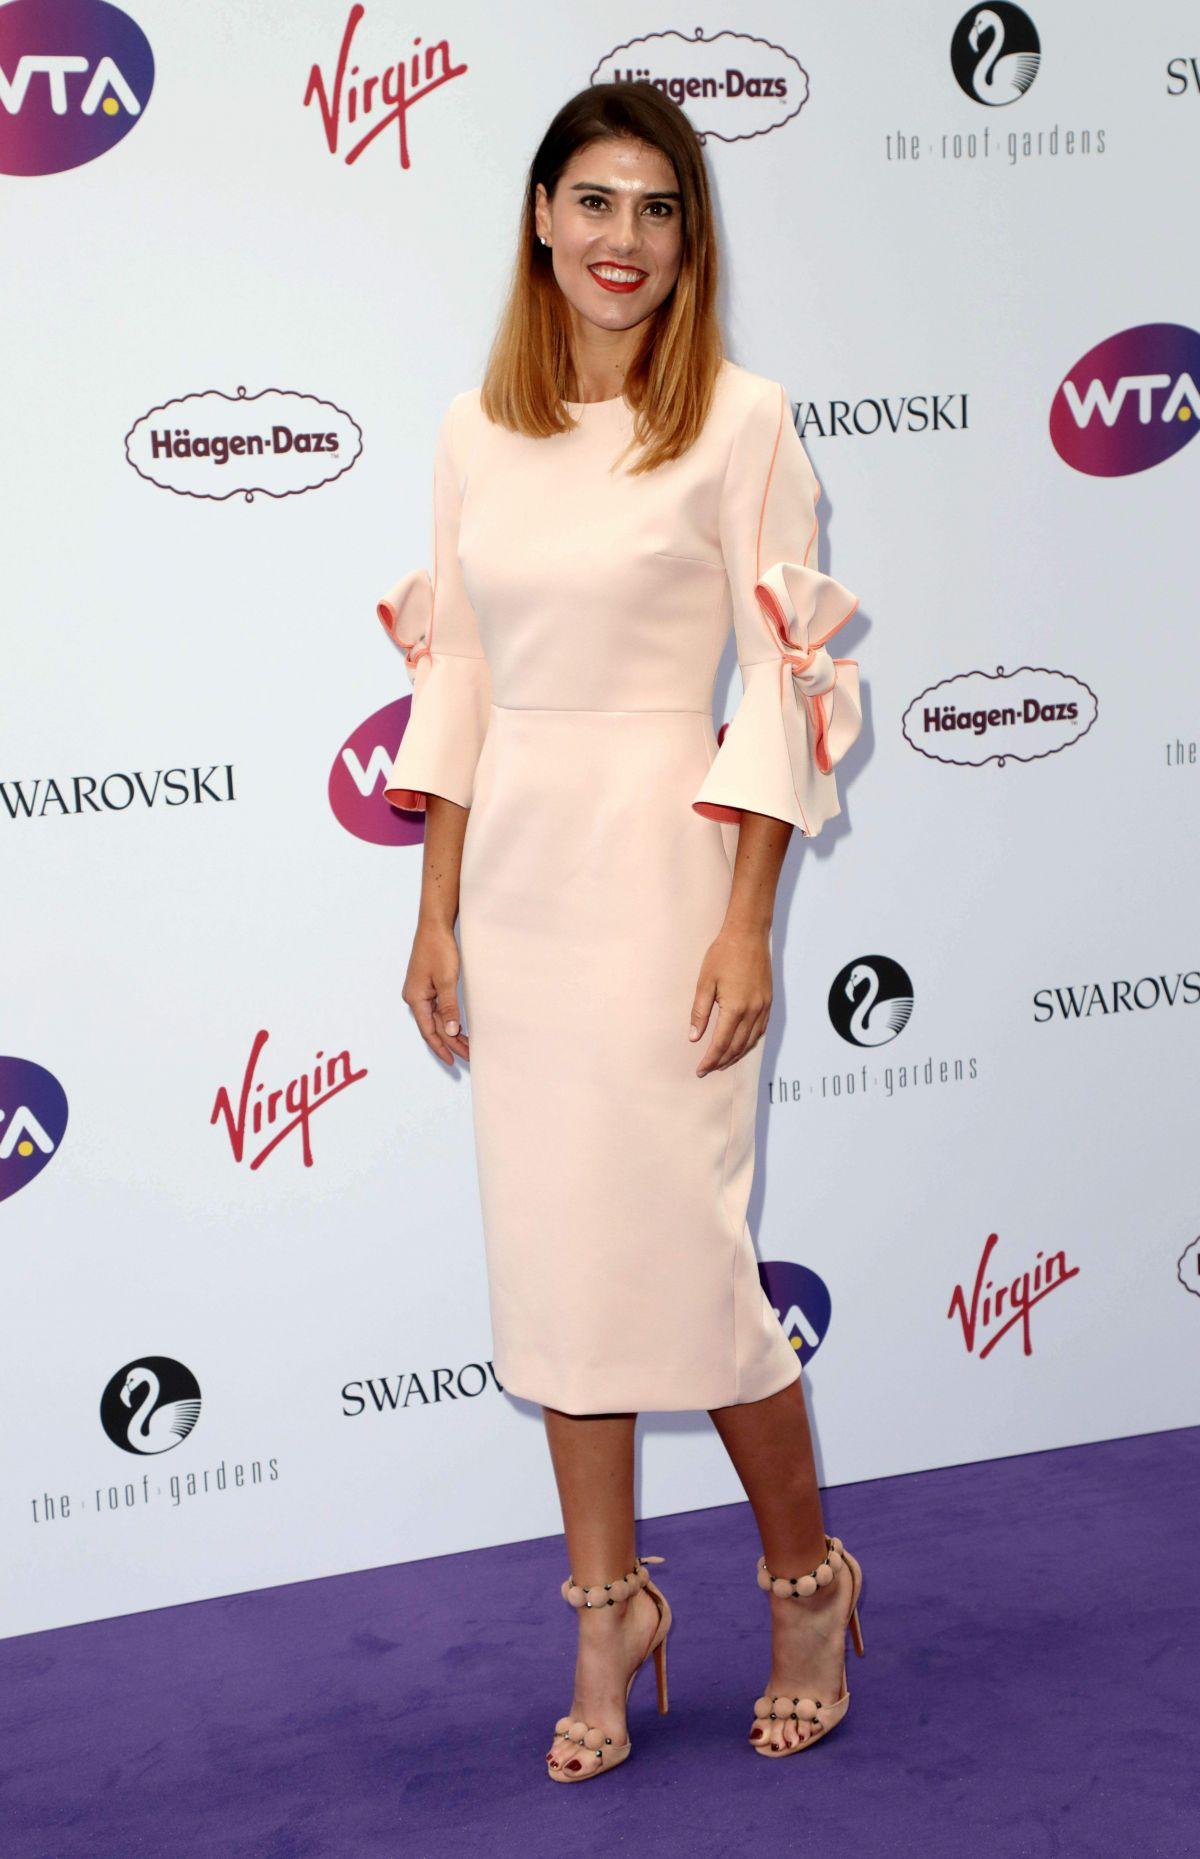 SORANA CIRSTEA at Pre-Wimbledon Party in London 06/29/2017 ...